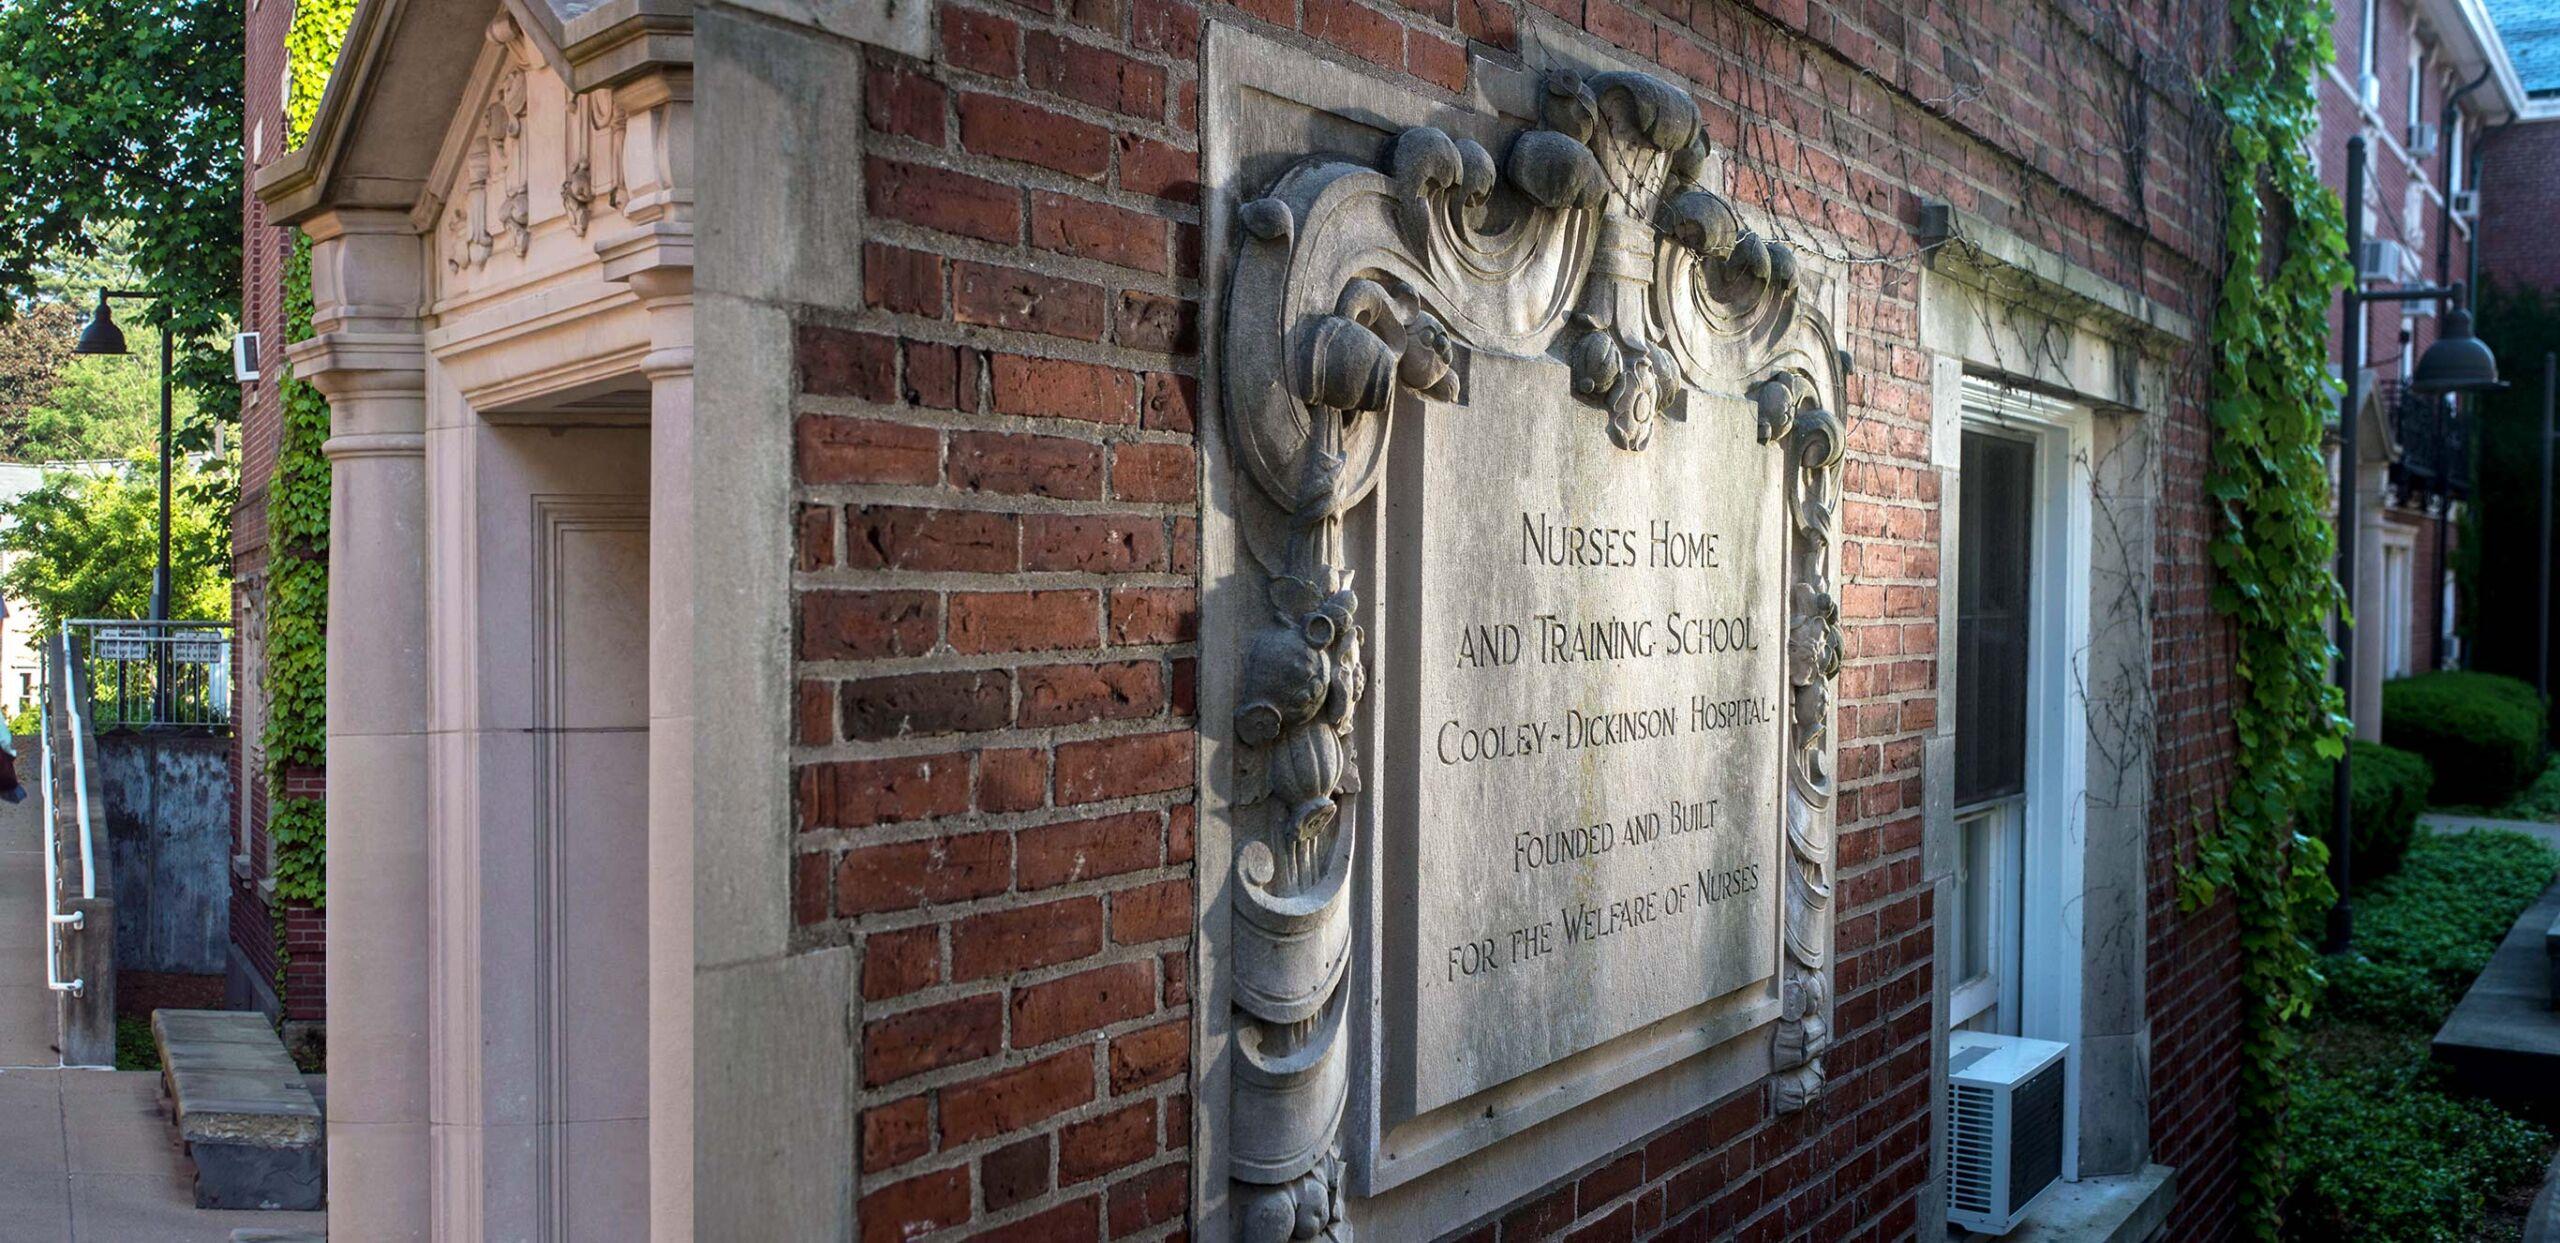 Cooley Dickinson Hospital: History